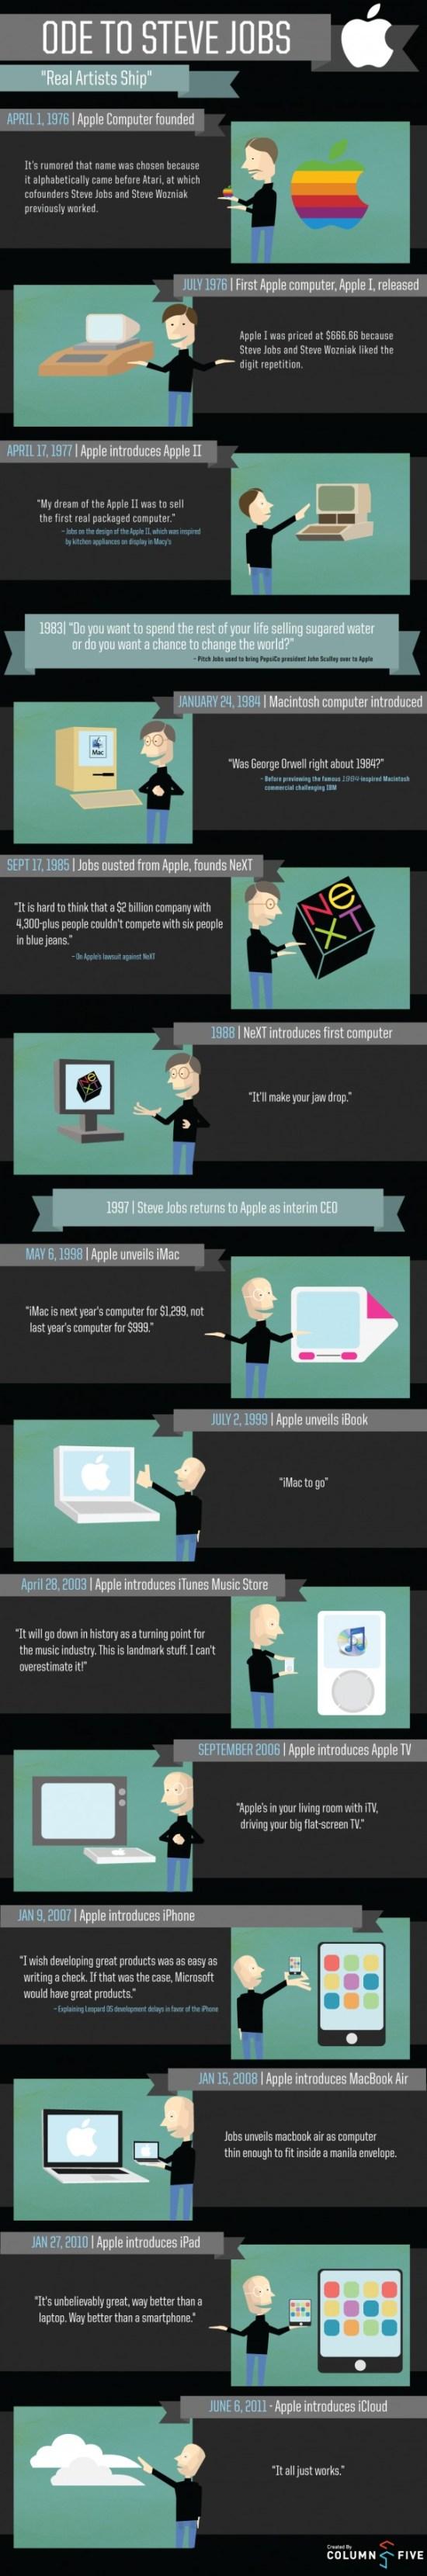 Steve Jobs - la carrière